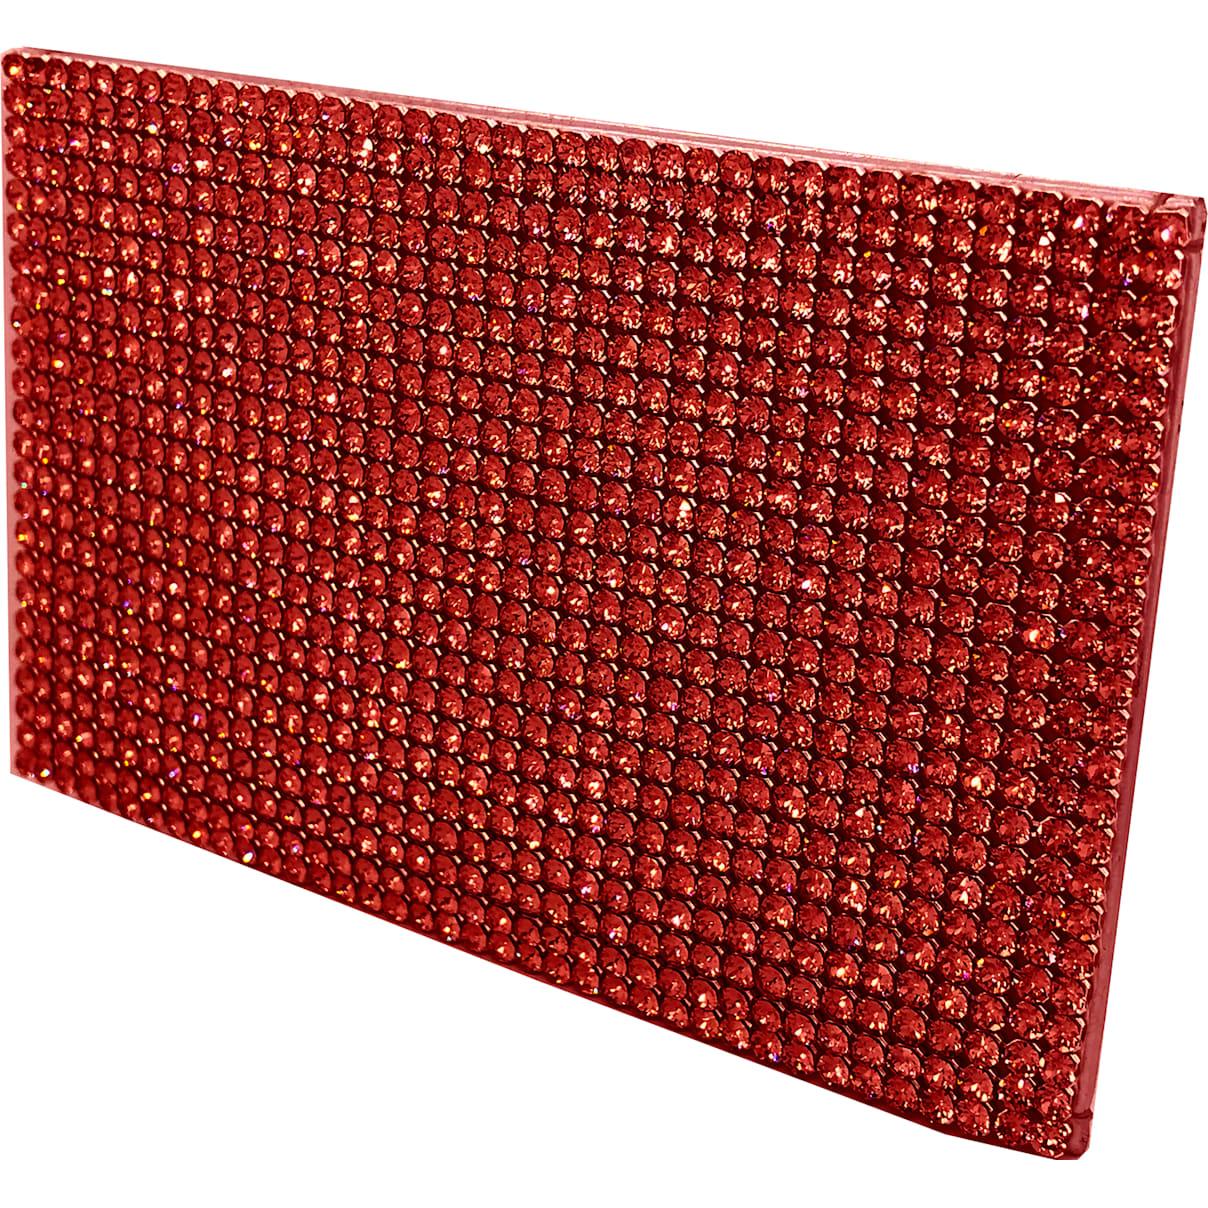 Swarovski Marina Card Holder, Red